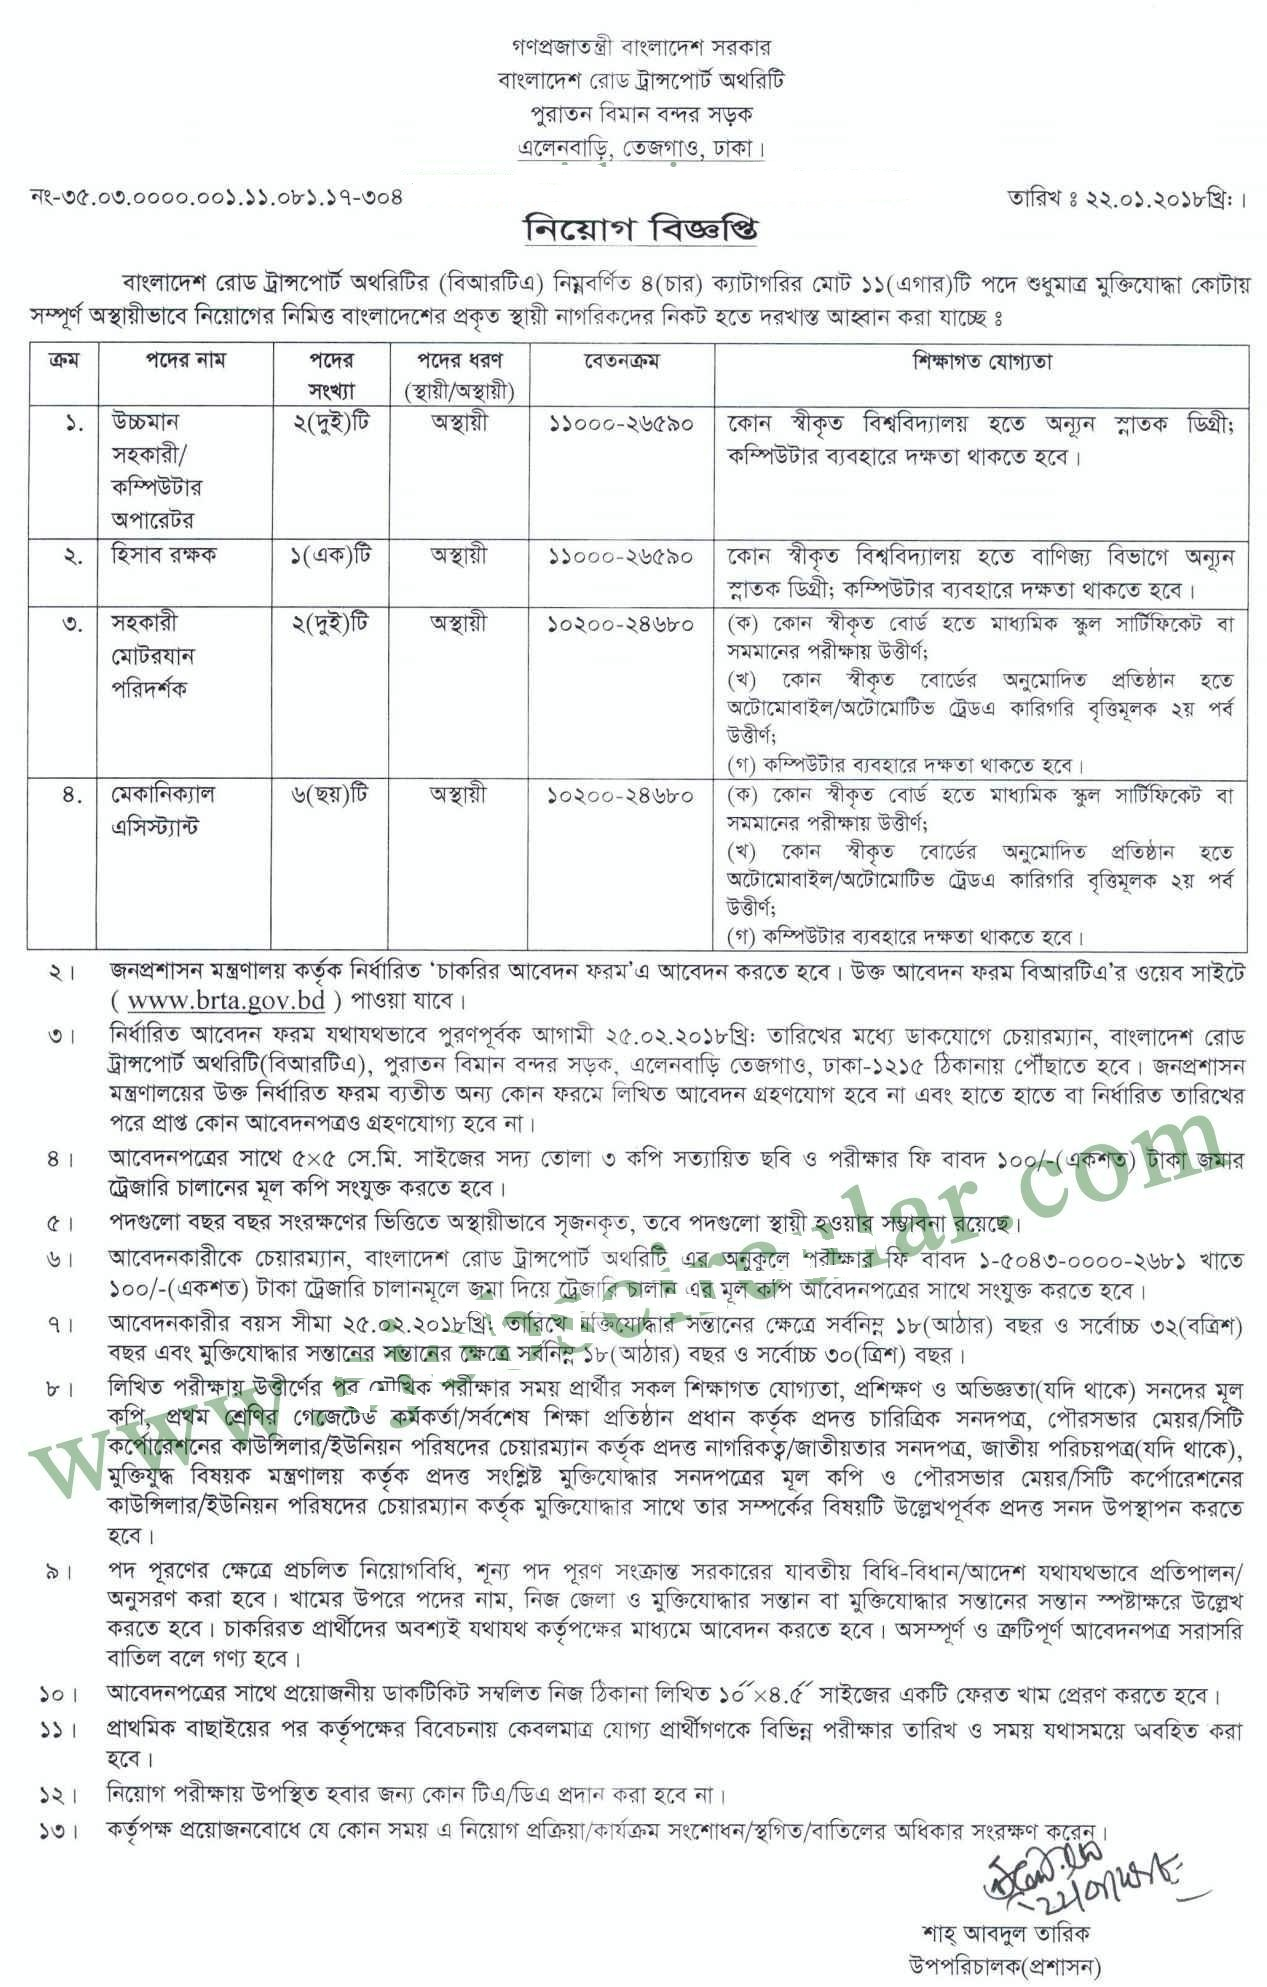 Bangladesh Road Transport Authority BRTA Job Circular 2018